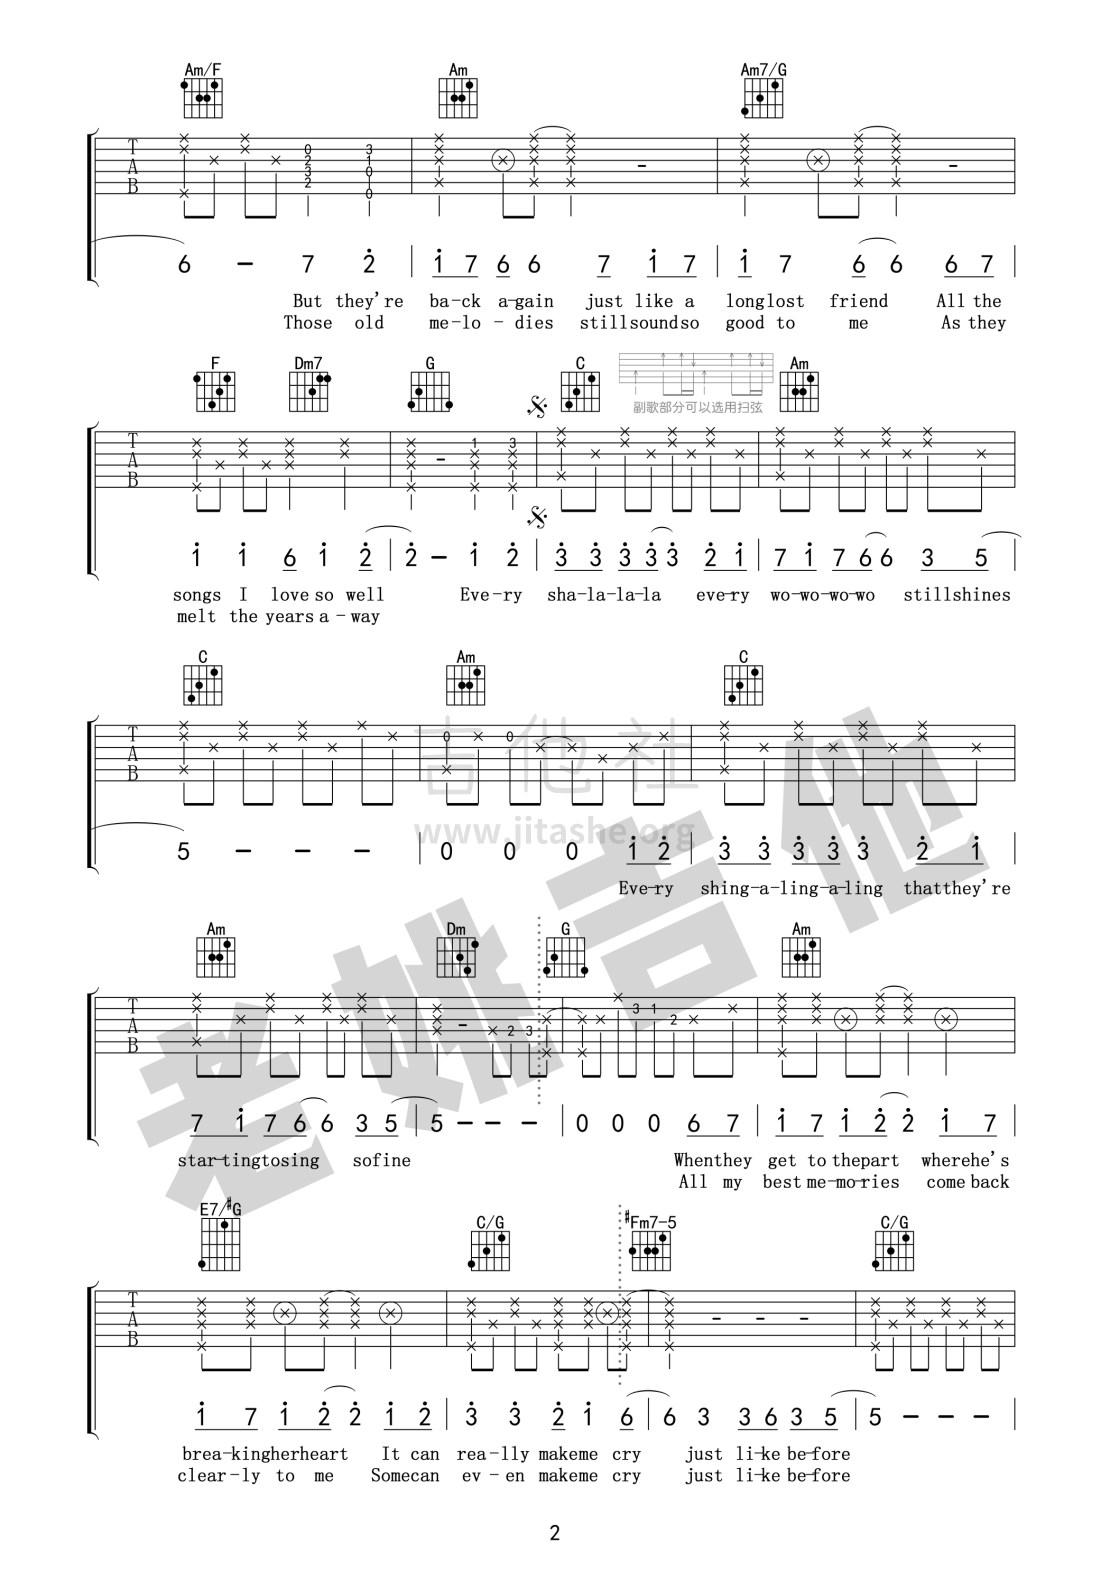 Yesterday Once More(昨日重现)吉他谱(图片谱,弹唱,伴奏,老姚吉他)_Carpenters(卡朋特;木匠兄妹)_昨日重现02.jpg